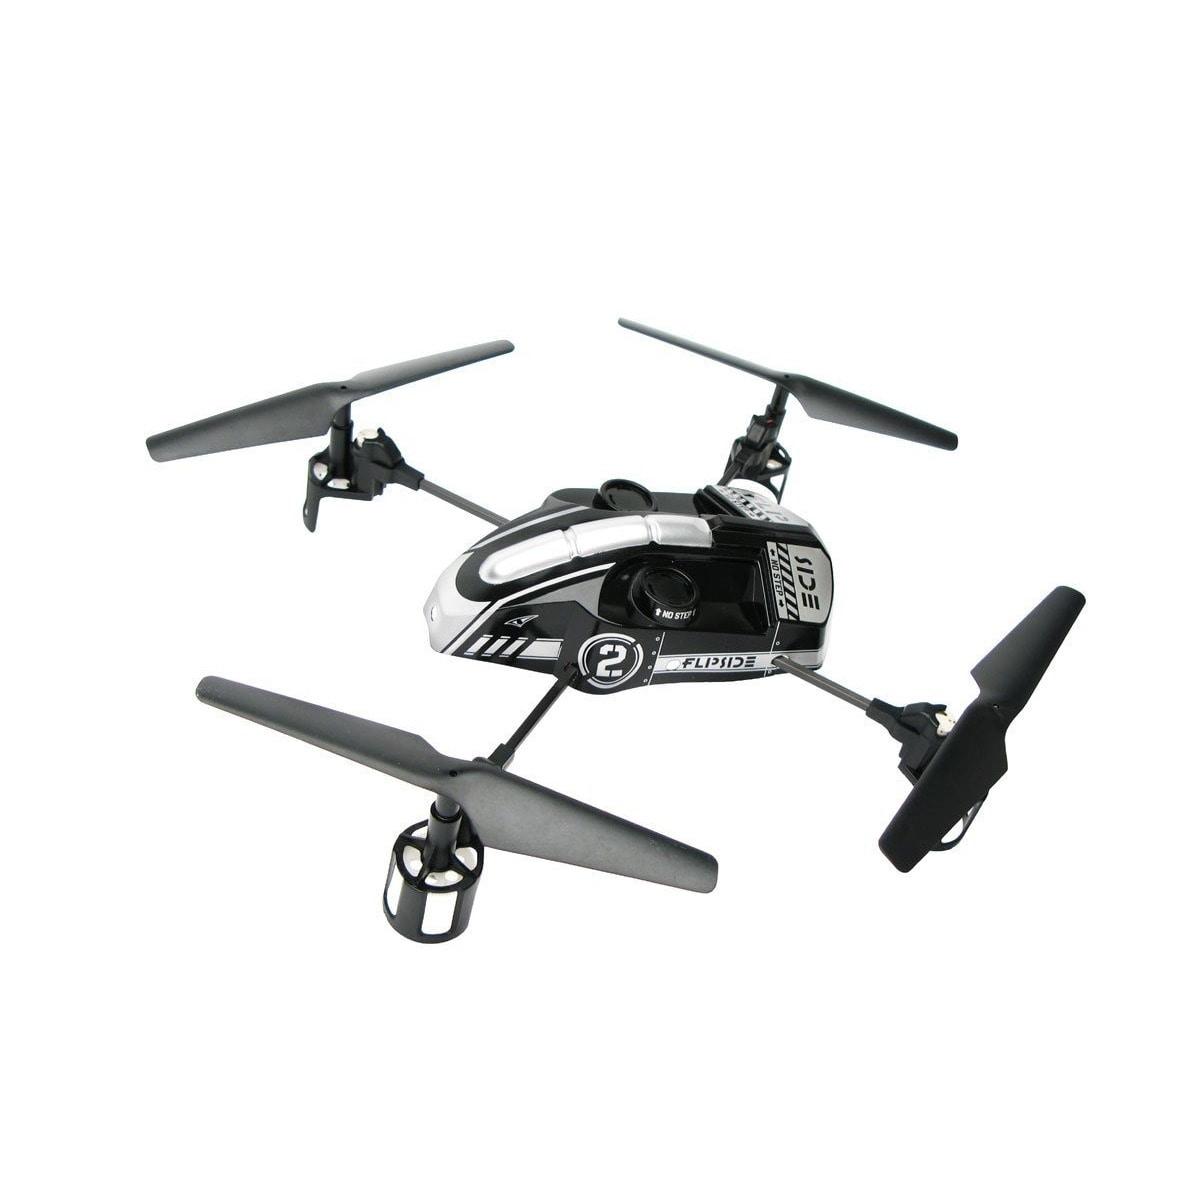 SEAICH Flipside Quadcopter 11.5-inch Drone (Silver), Black